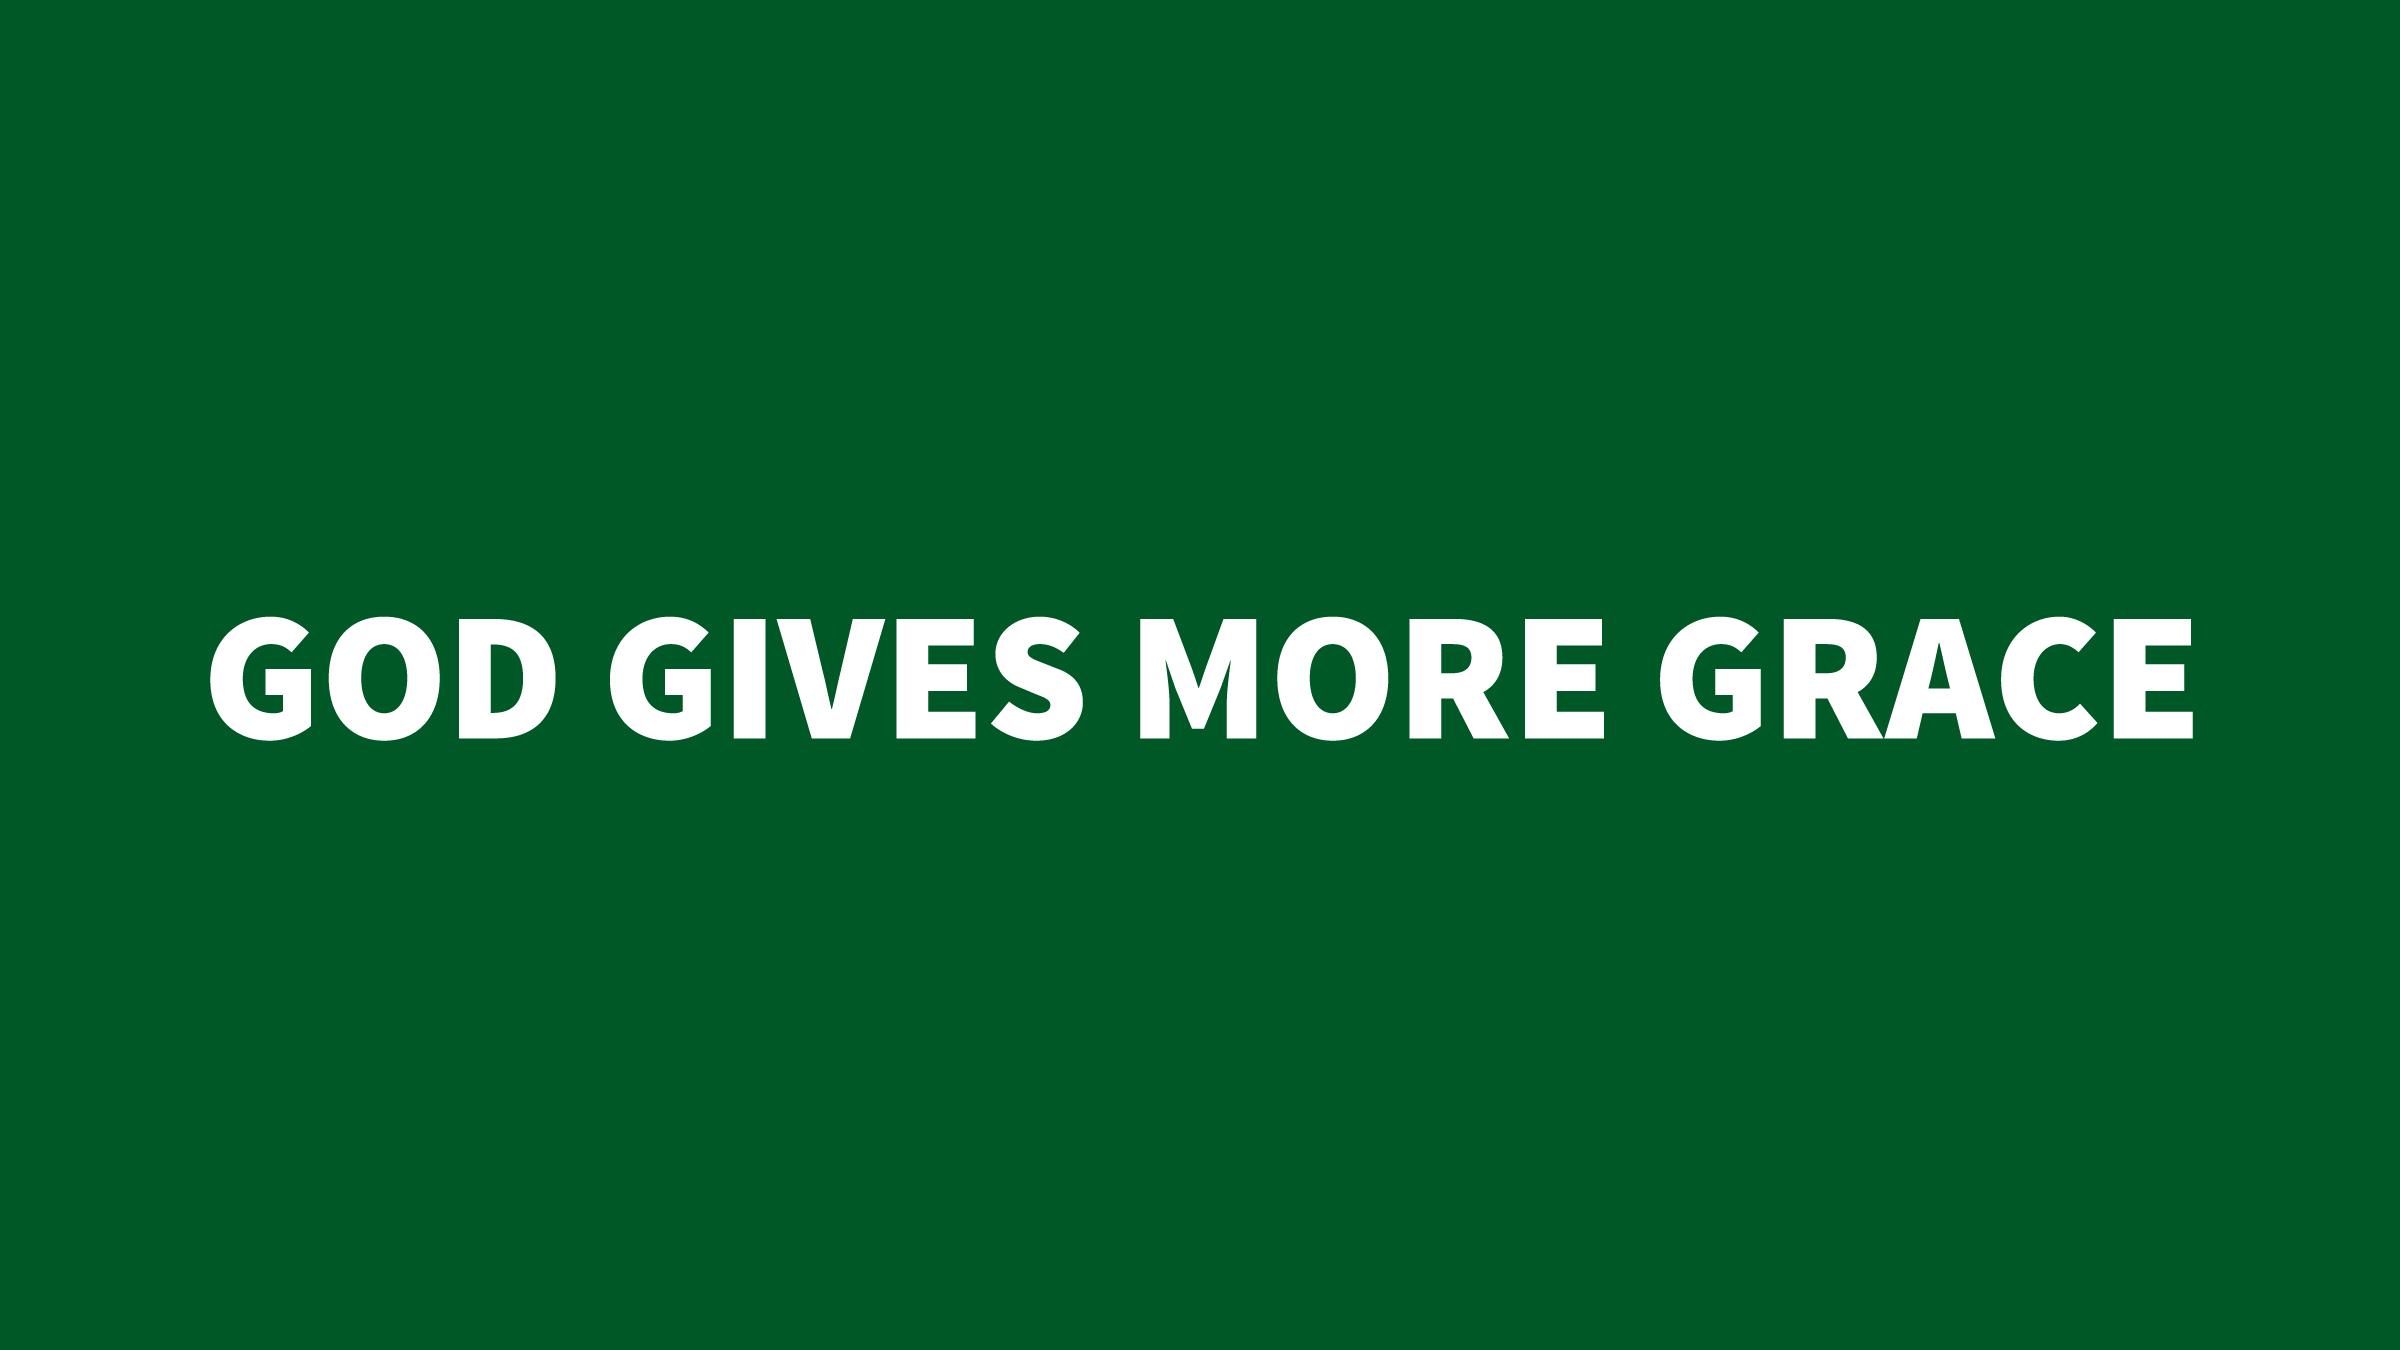 James 4 - God gives more grace (green).jpg